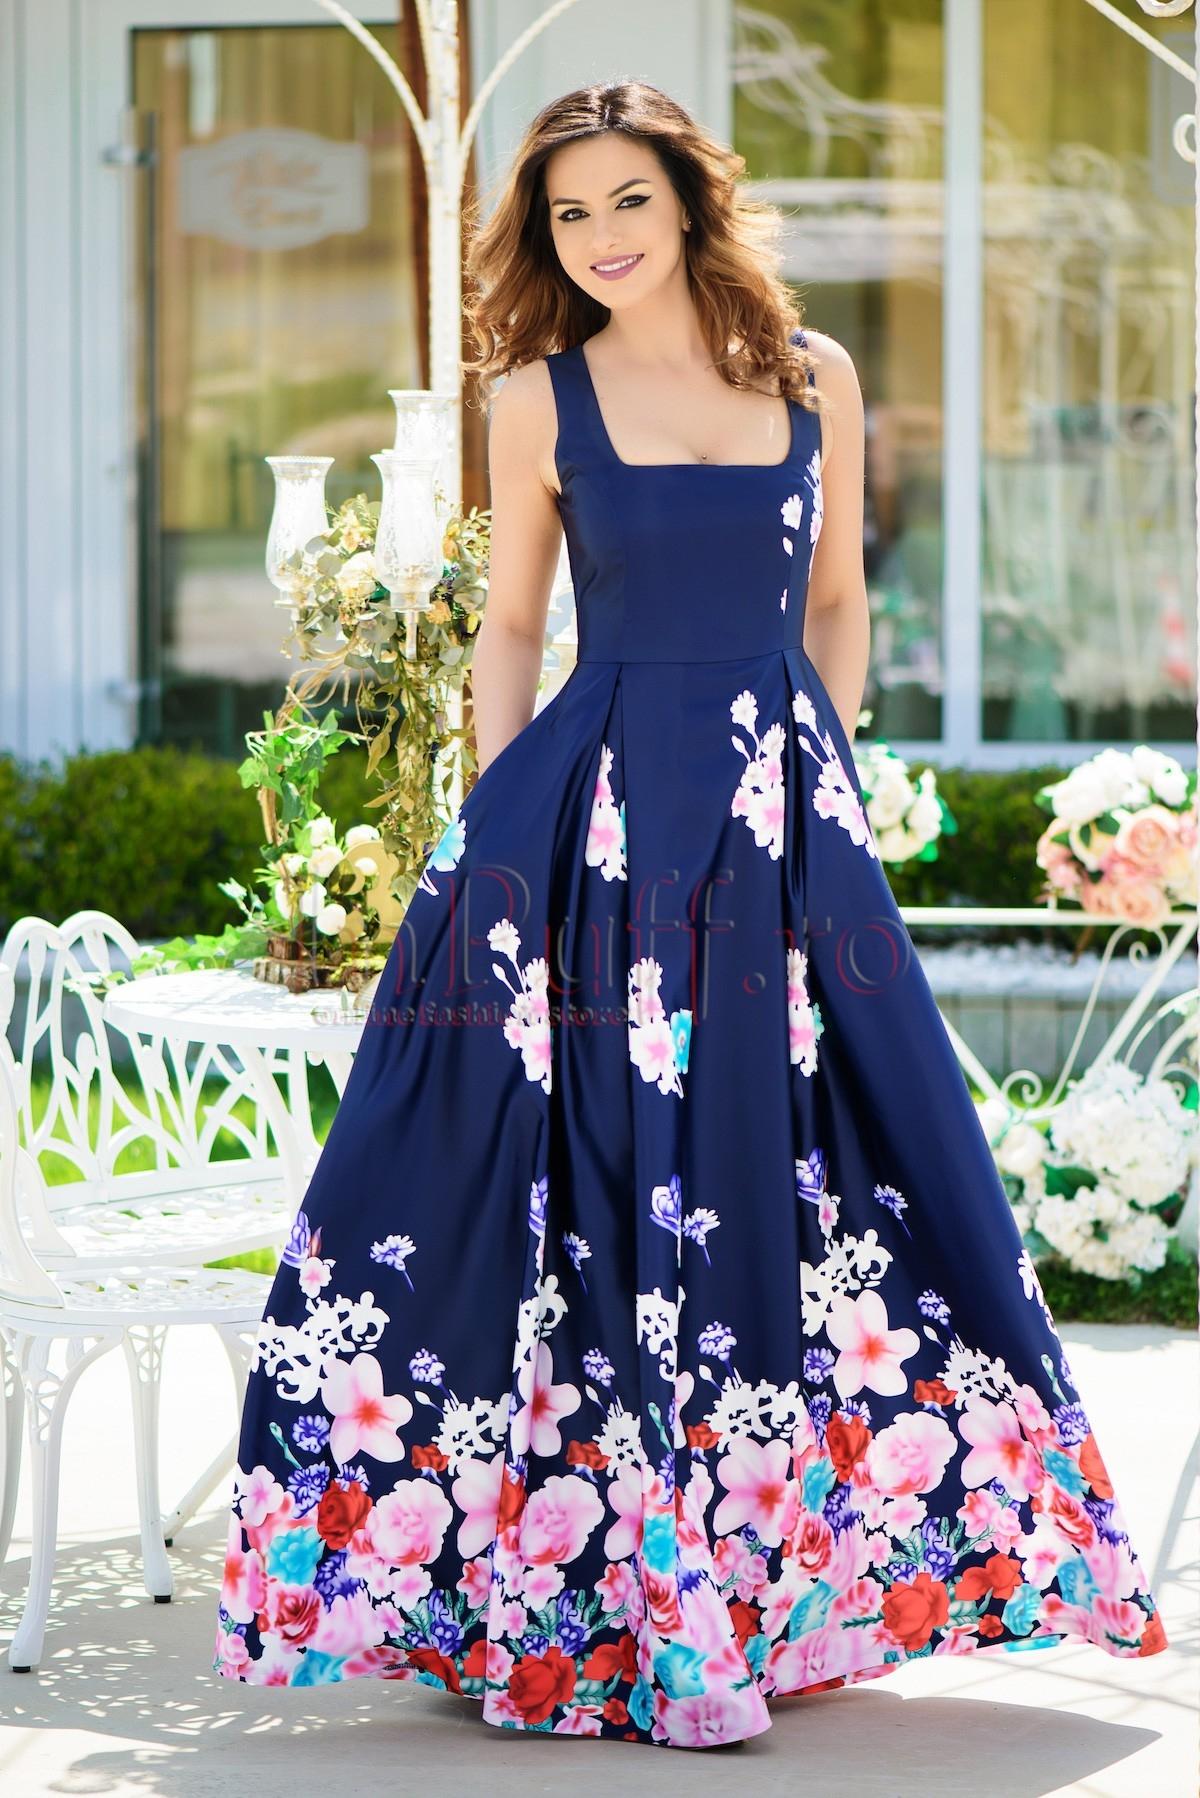 Rochie MBG de seara lunga bleumarin cu imprimeu trandafiri